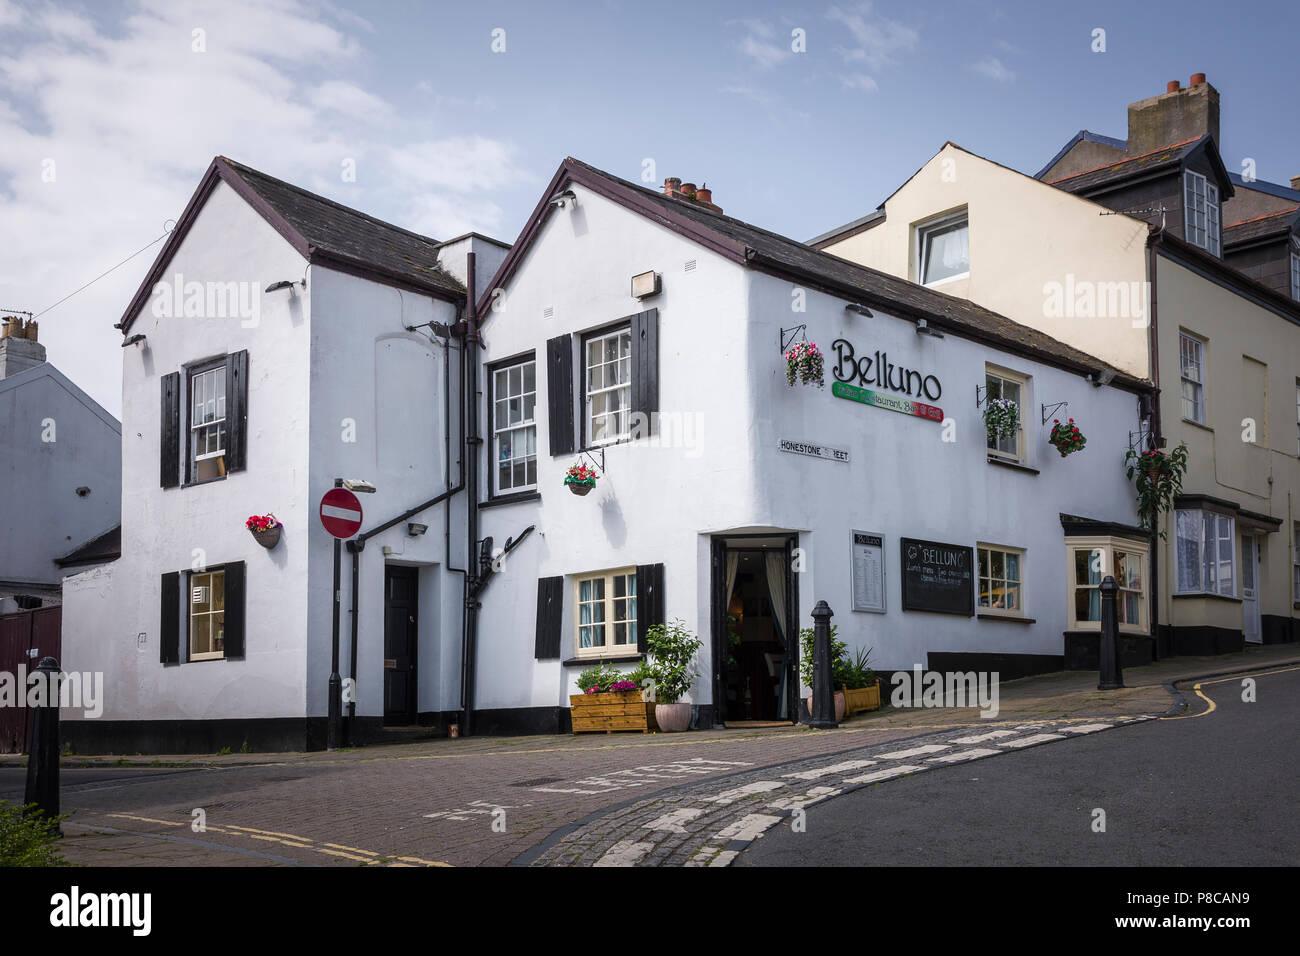 Belluno and Italian restaurant in the old part of Bideford Devon England UK - Stock Image